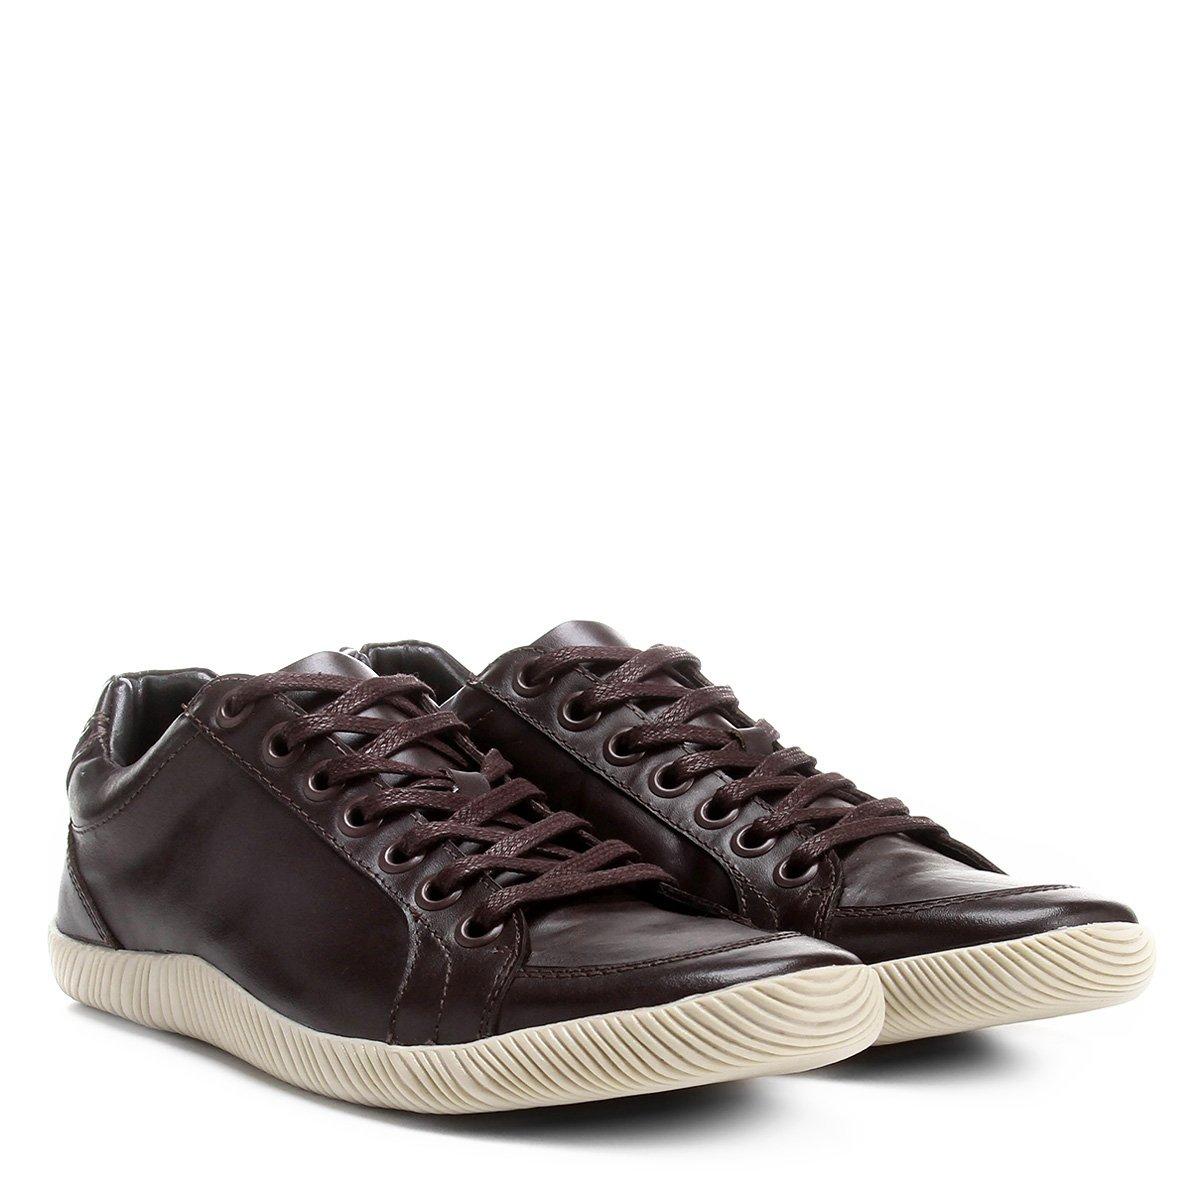 28f0ca3a8f Sapatênis Couro Shoestock Masculino